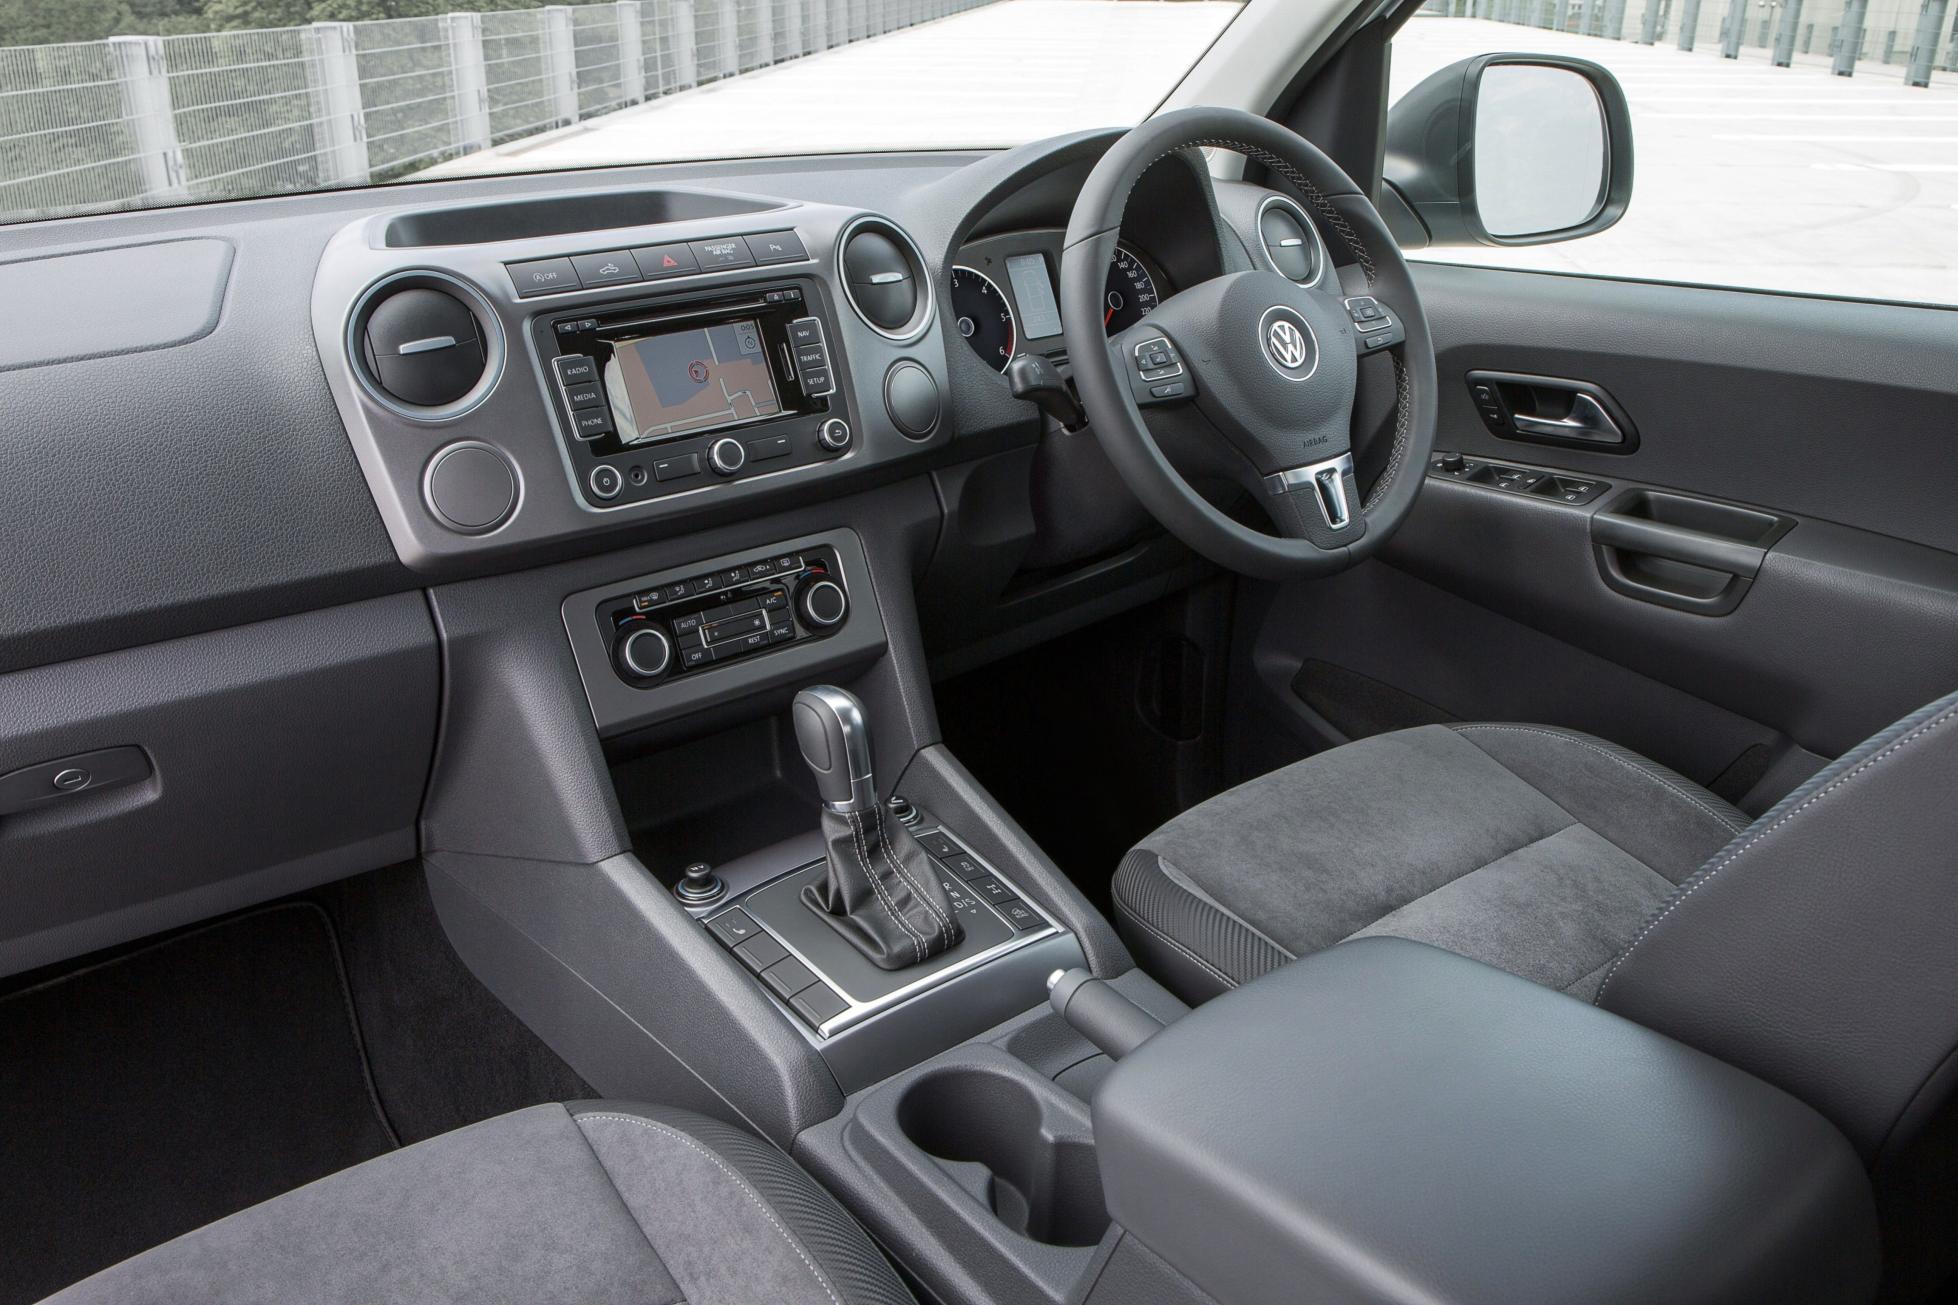 Volkswagen Amarok Dark Label Priced In The Uk From 163 26 125